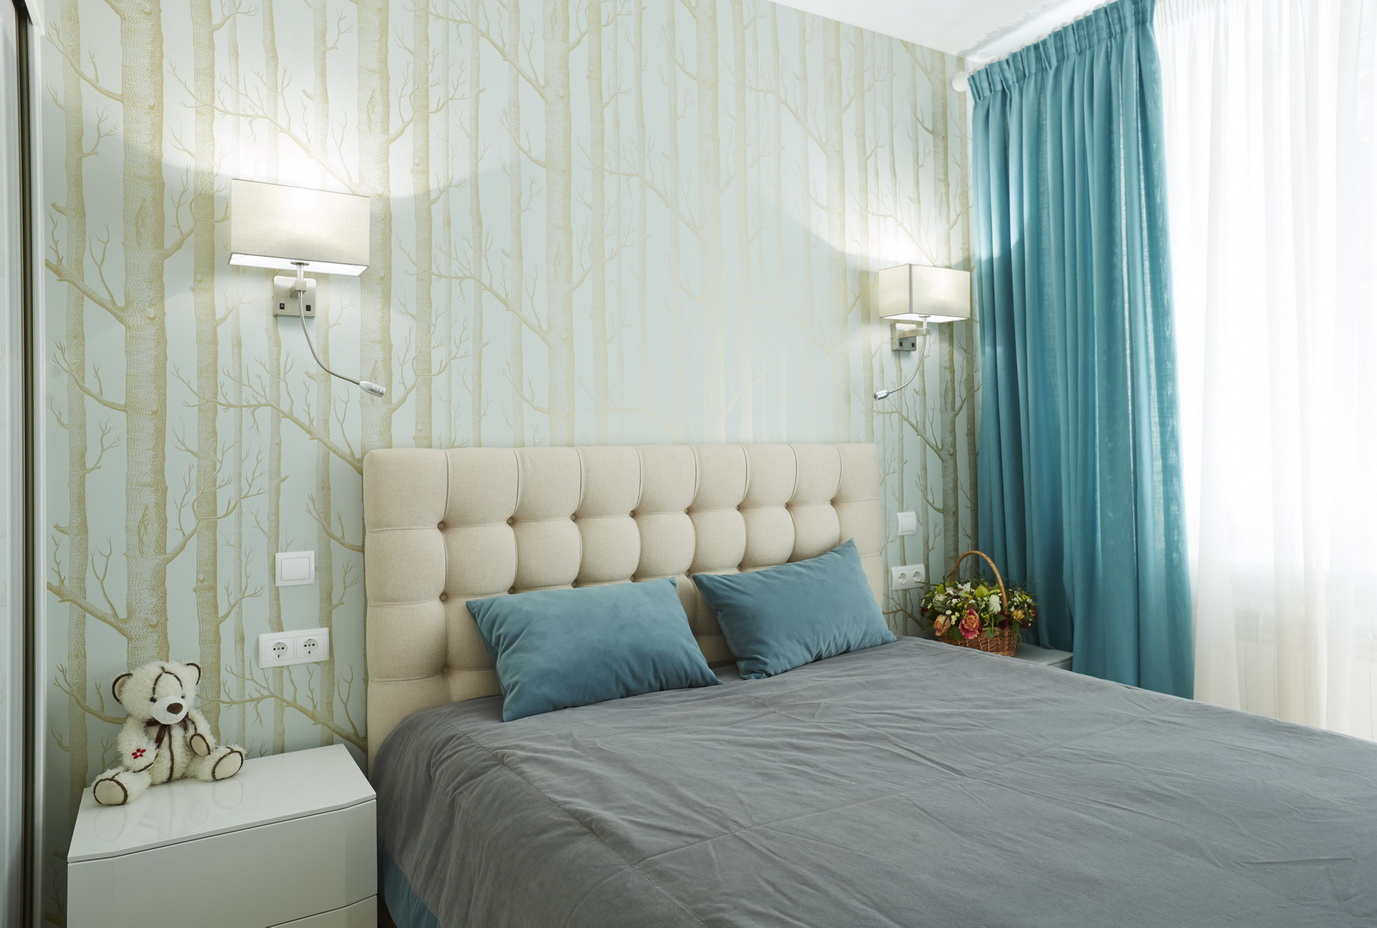 Ремонт однокомнатной квартиры - ммм (1) - 1